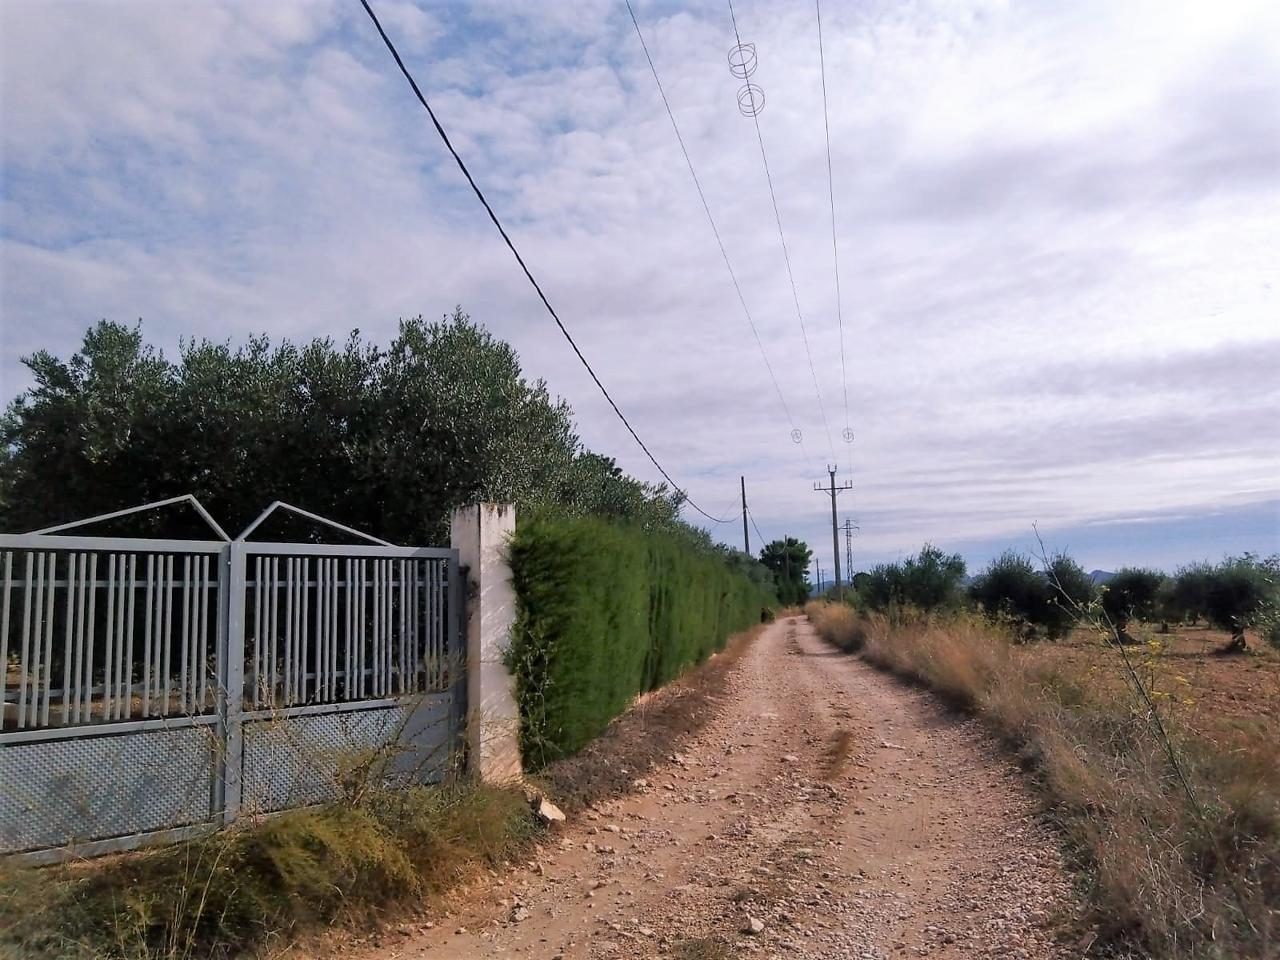 Area edificabile urbana  Calle partida baiona. Terreno de 13.985m2 aprox. con 500 olivos aproximadamente en ple